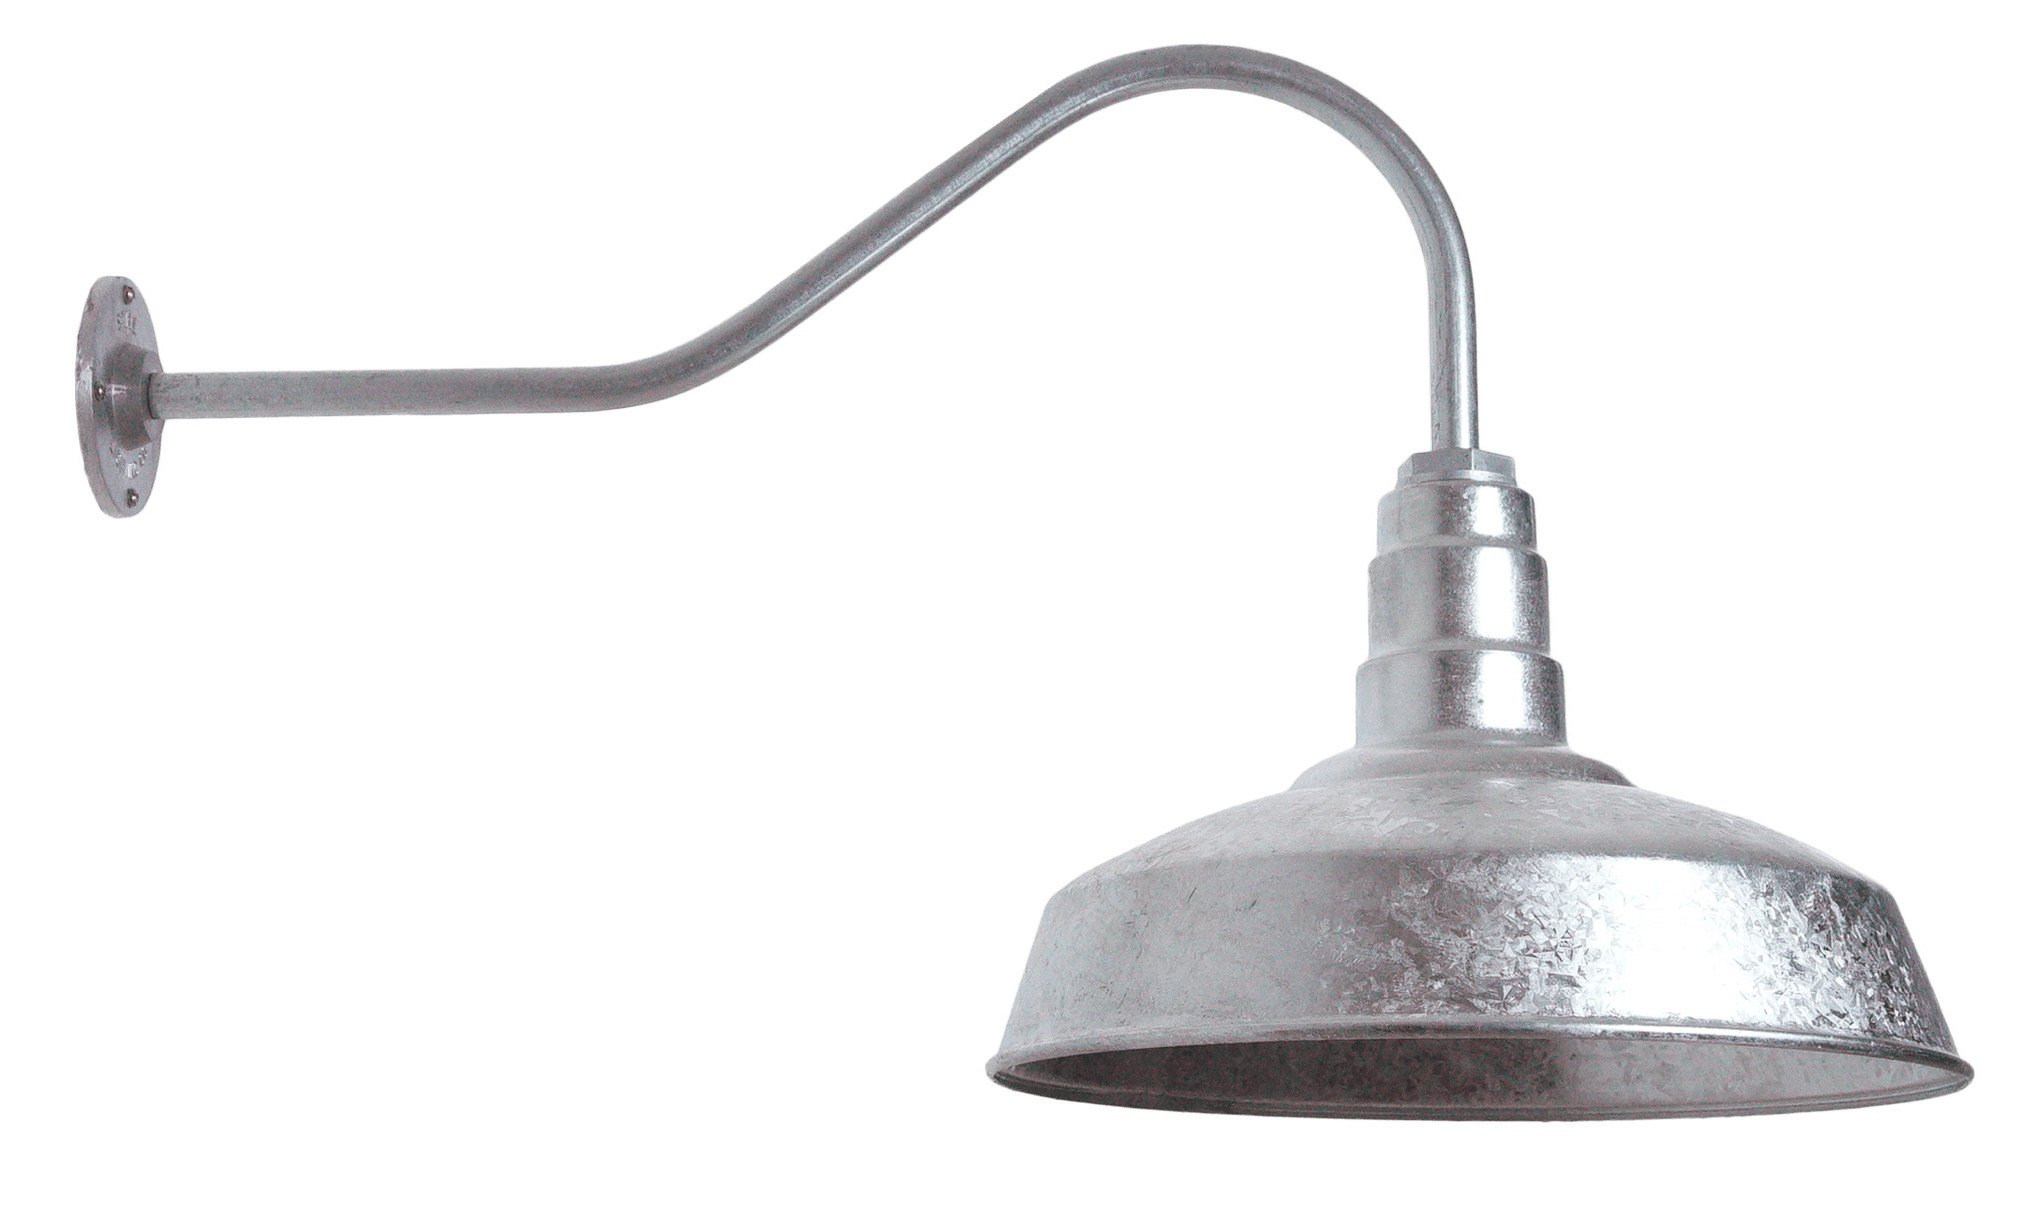 The ABBA Standard Barn Light Kit | Farmhouse Steel Vintage Shade and Gooseneck | 16 Inch Shade and 23 Inch Gooseneck (Galvanized)